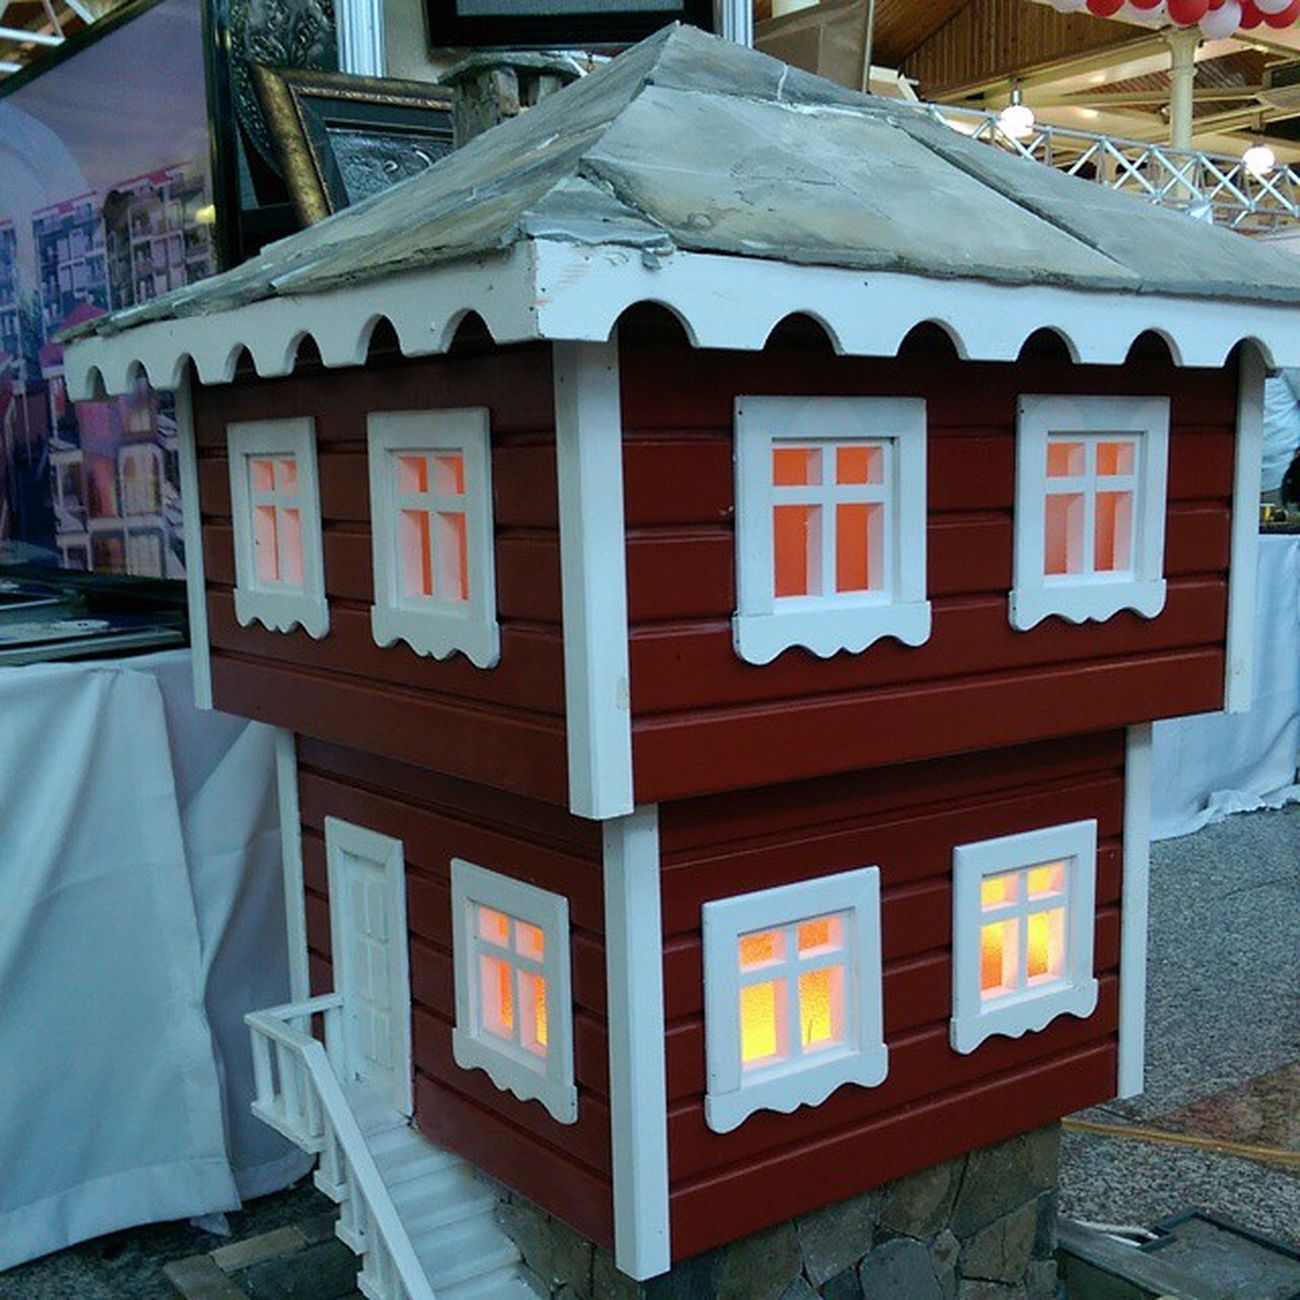 Feshane Kastamonu Günleri Feshane Kastamonu Eyüpsultan  Istanbul kermes senlik yoresel color maket home